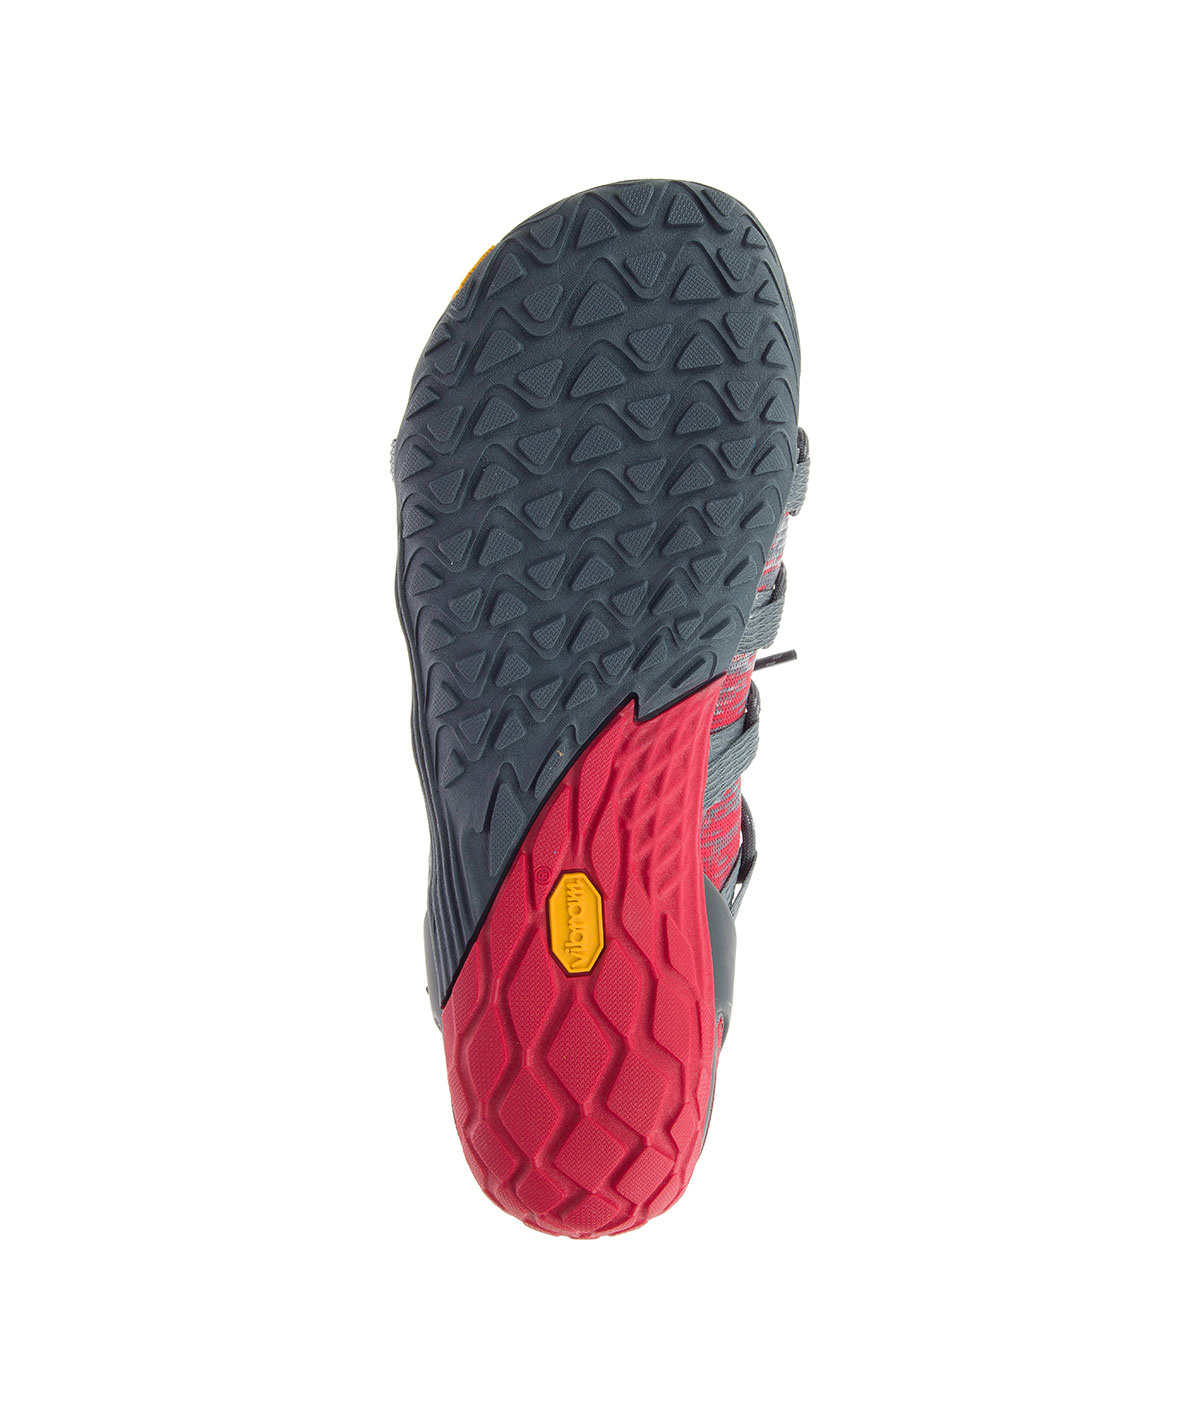 Vapor glove 4 3D turbulence/cherry